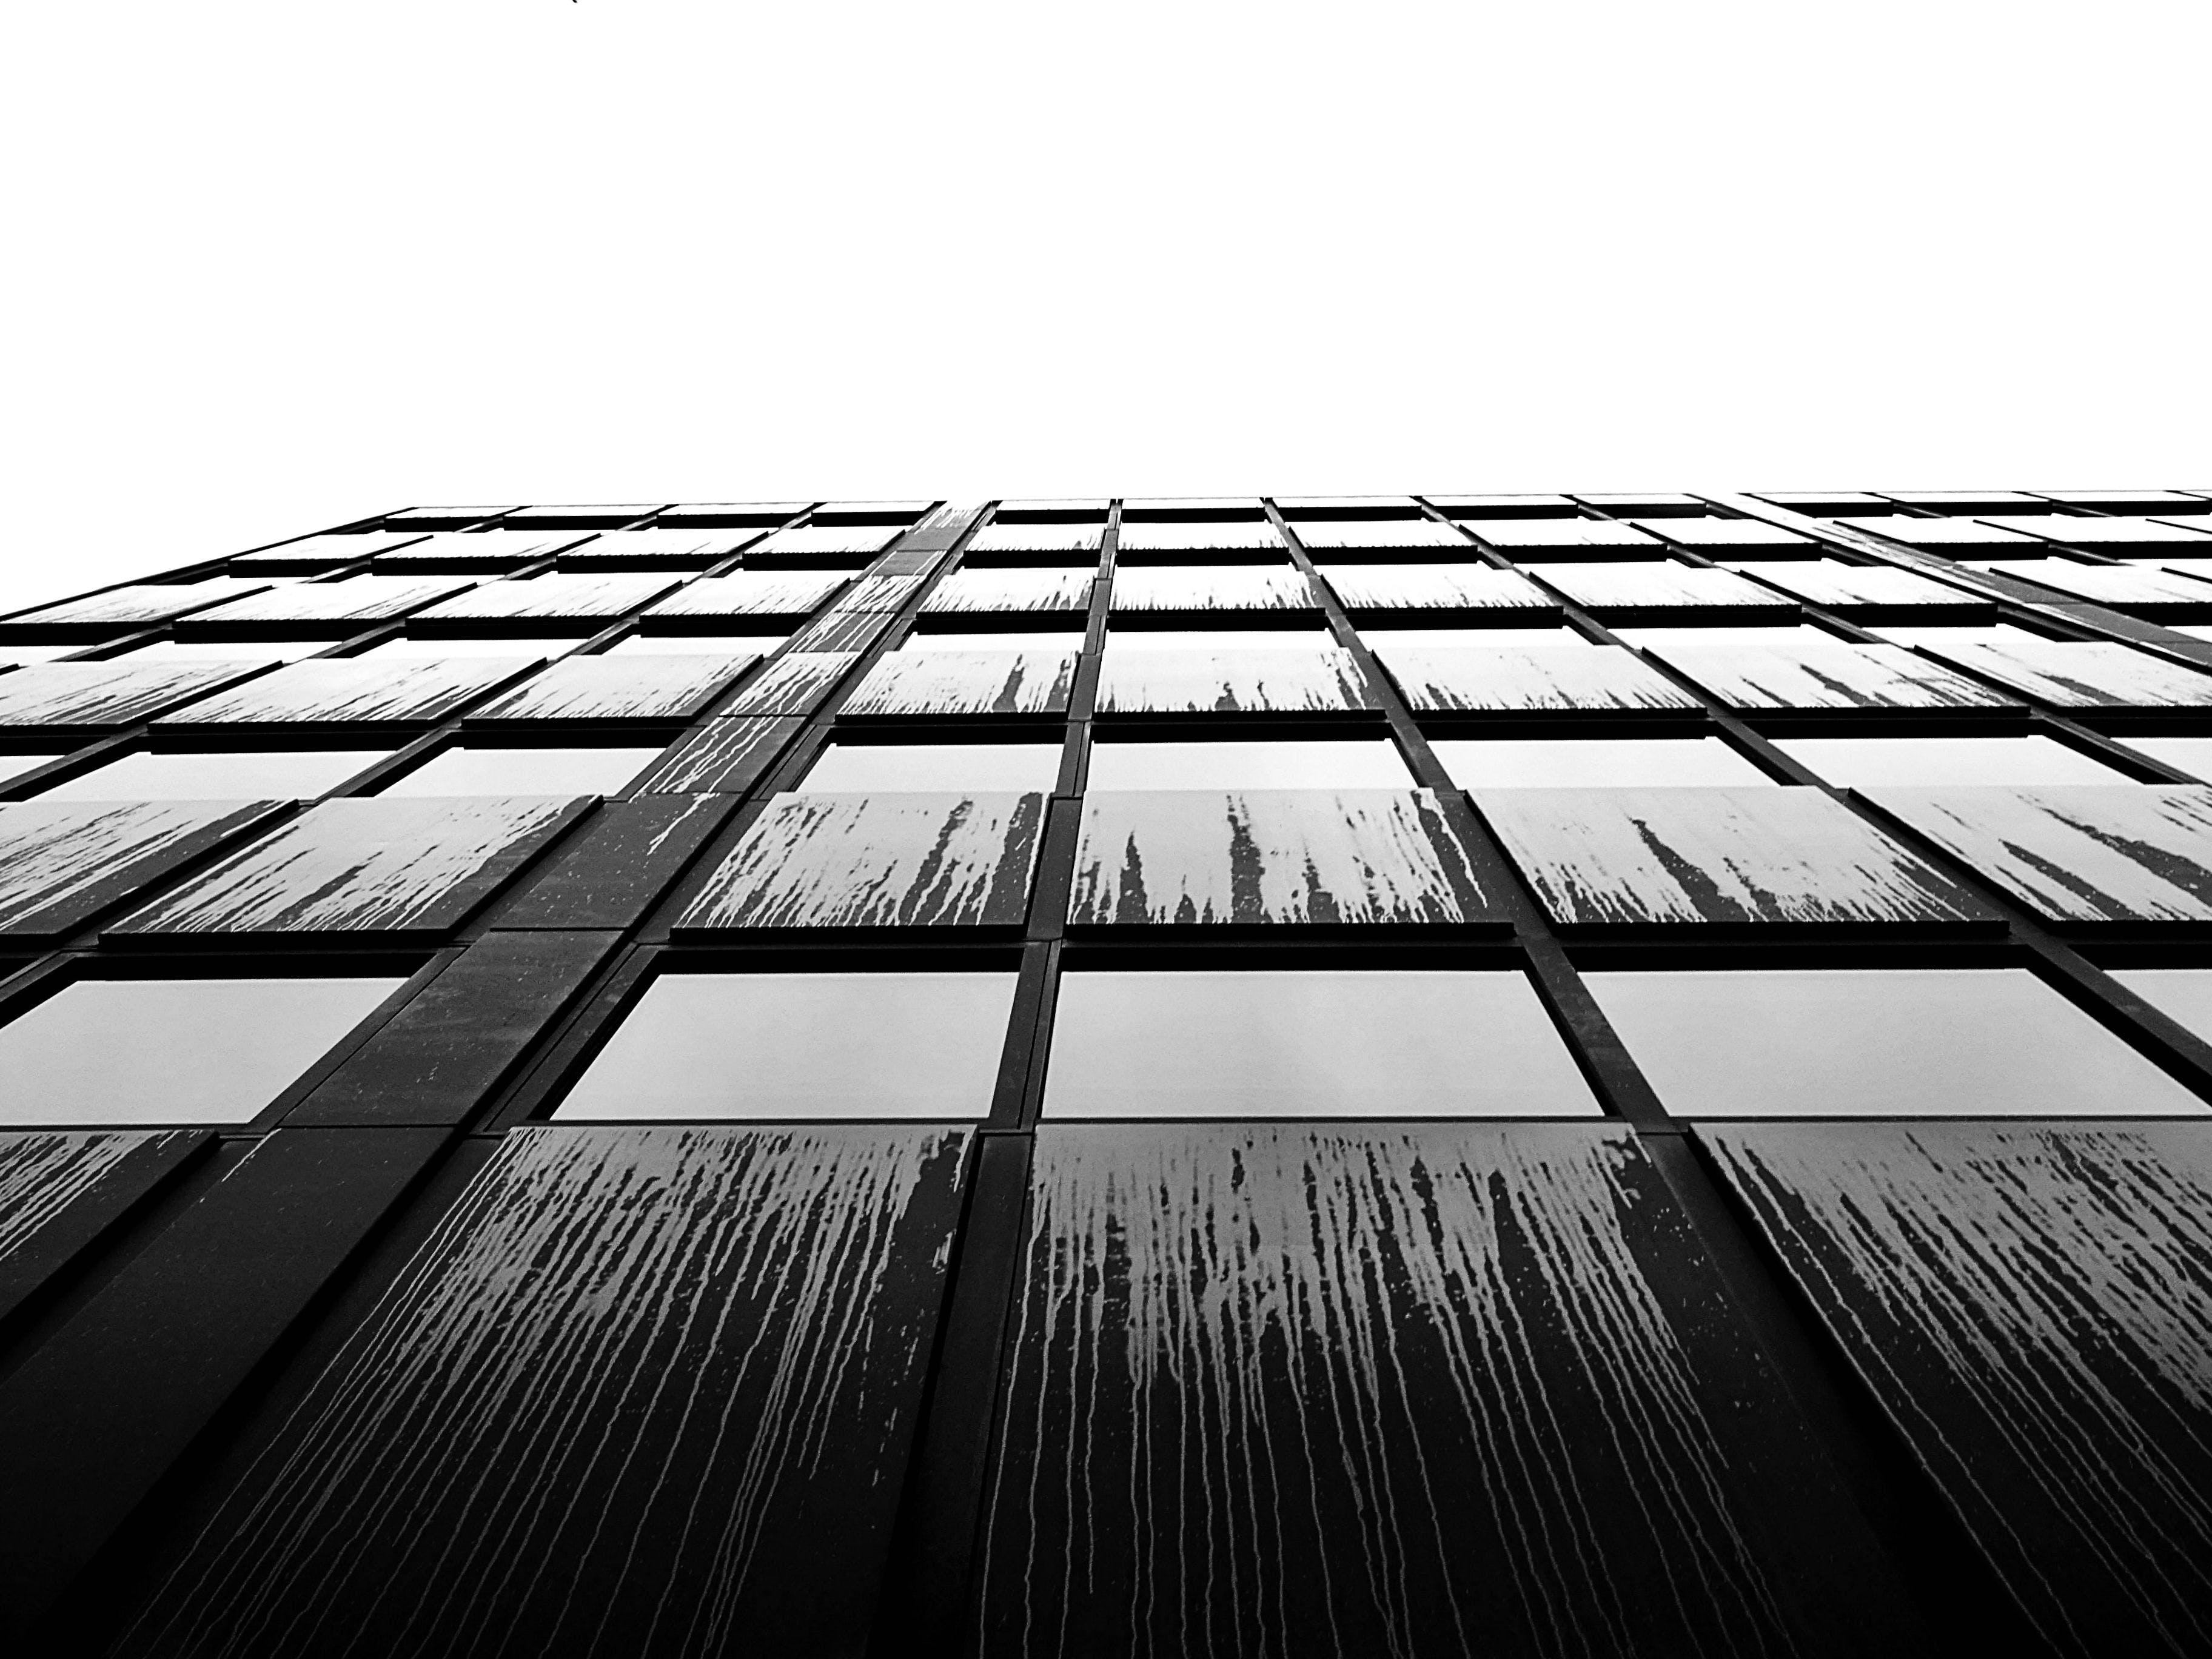 Grayscale Photo of Building Facade